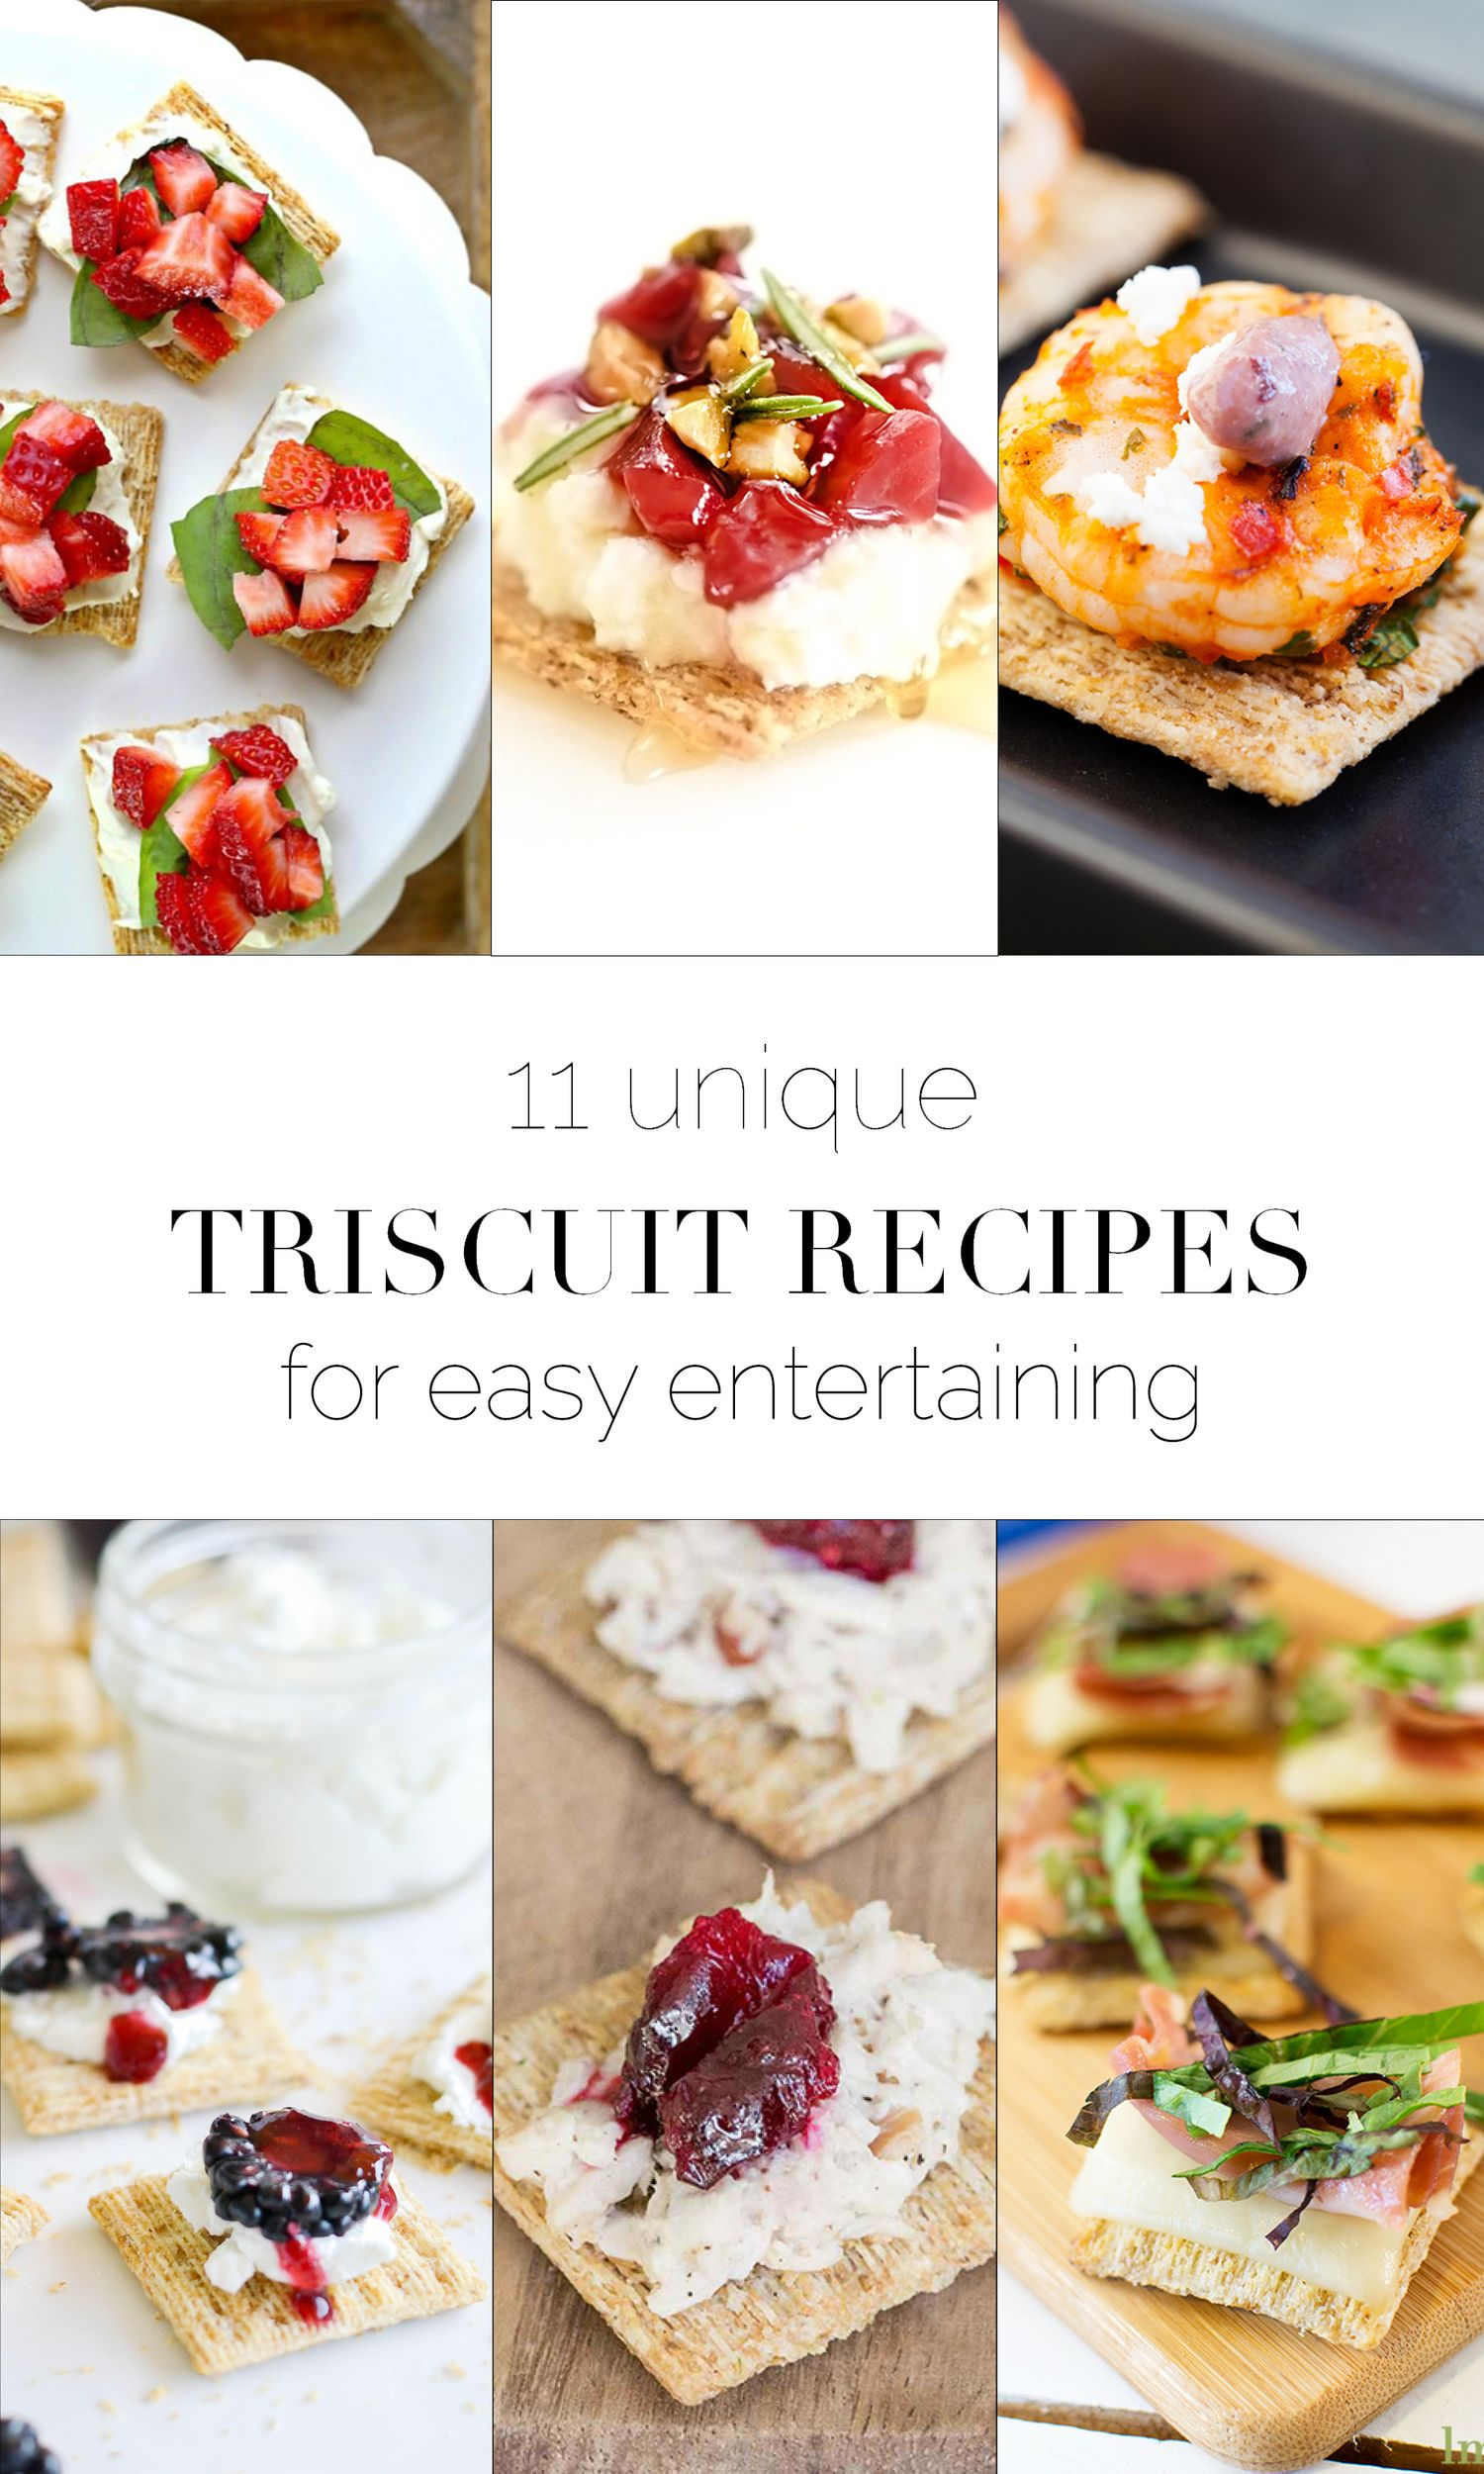 Unique Triscuit recipes to rock a party - such an easy appetizer! boxwoodavenue.com